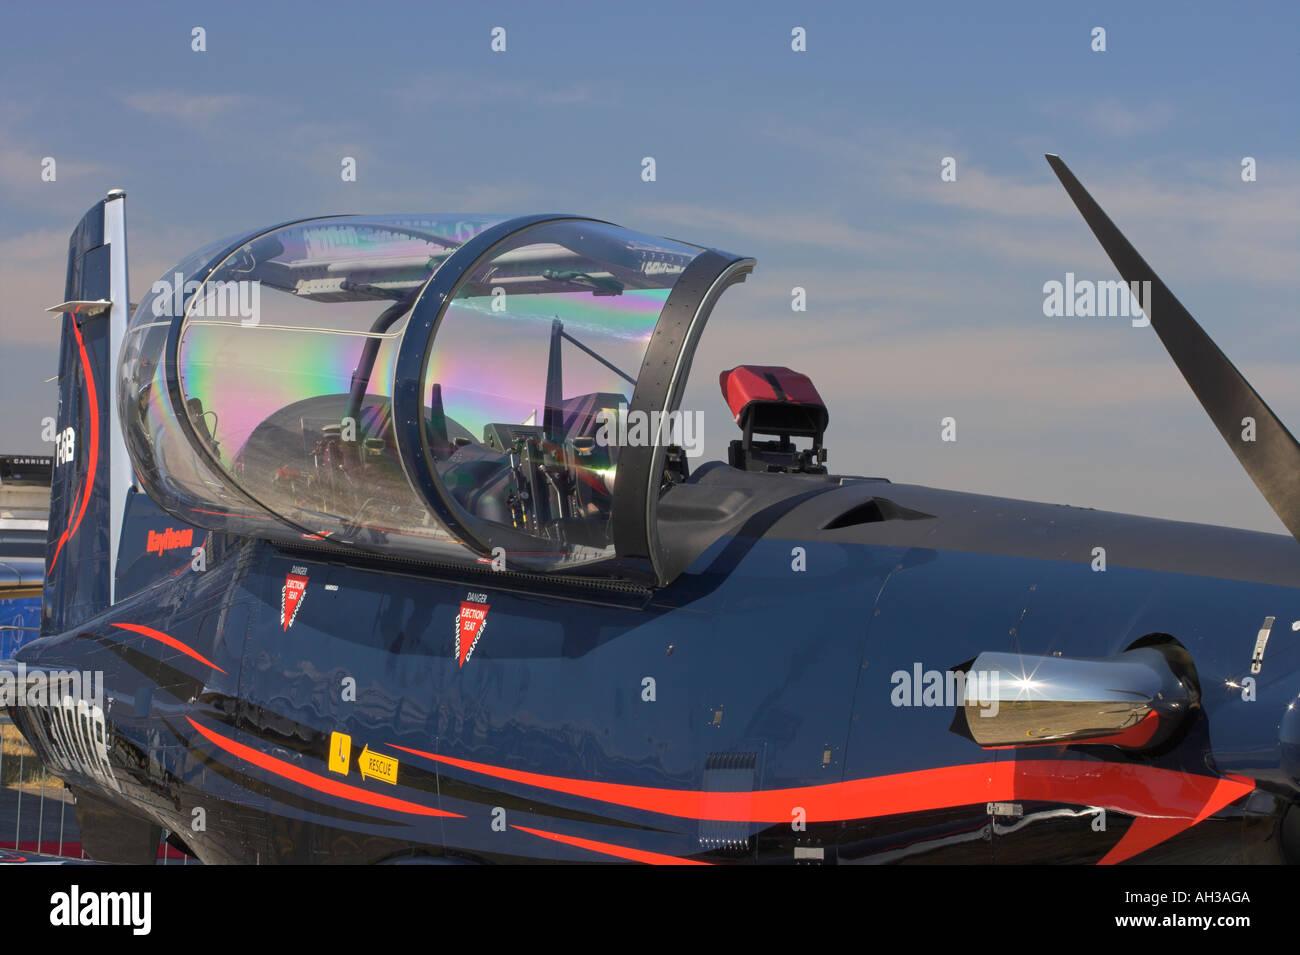 Beechcraft T6 Raytheon with open canopy - Stock Image